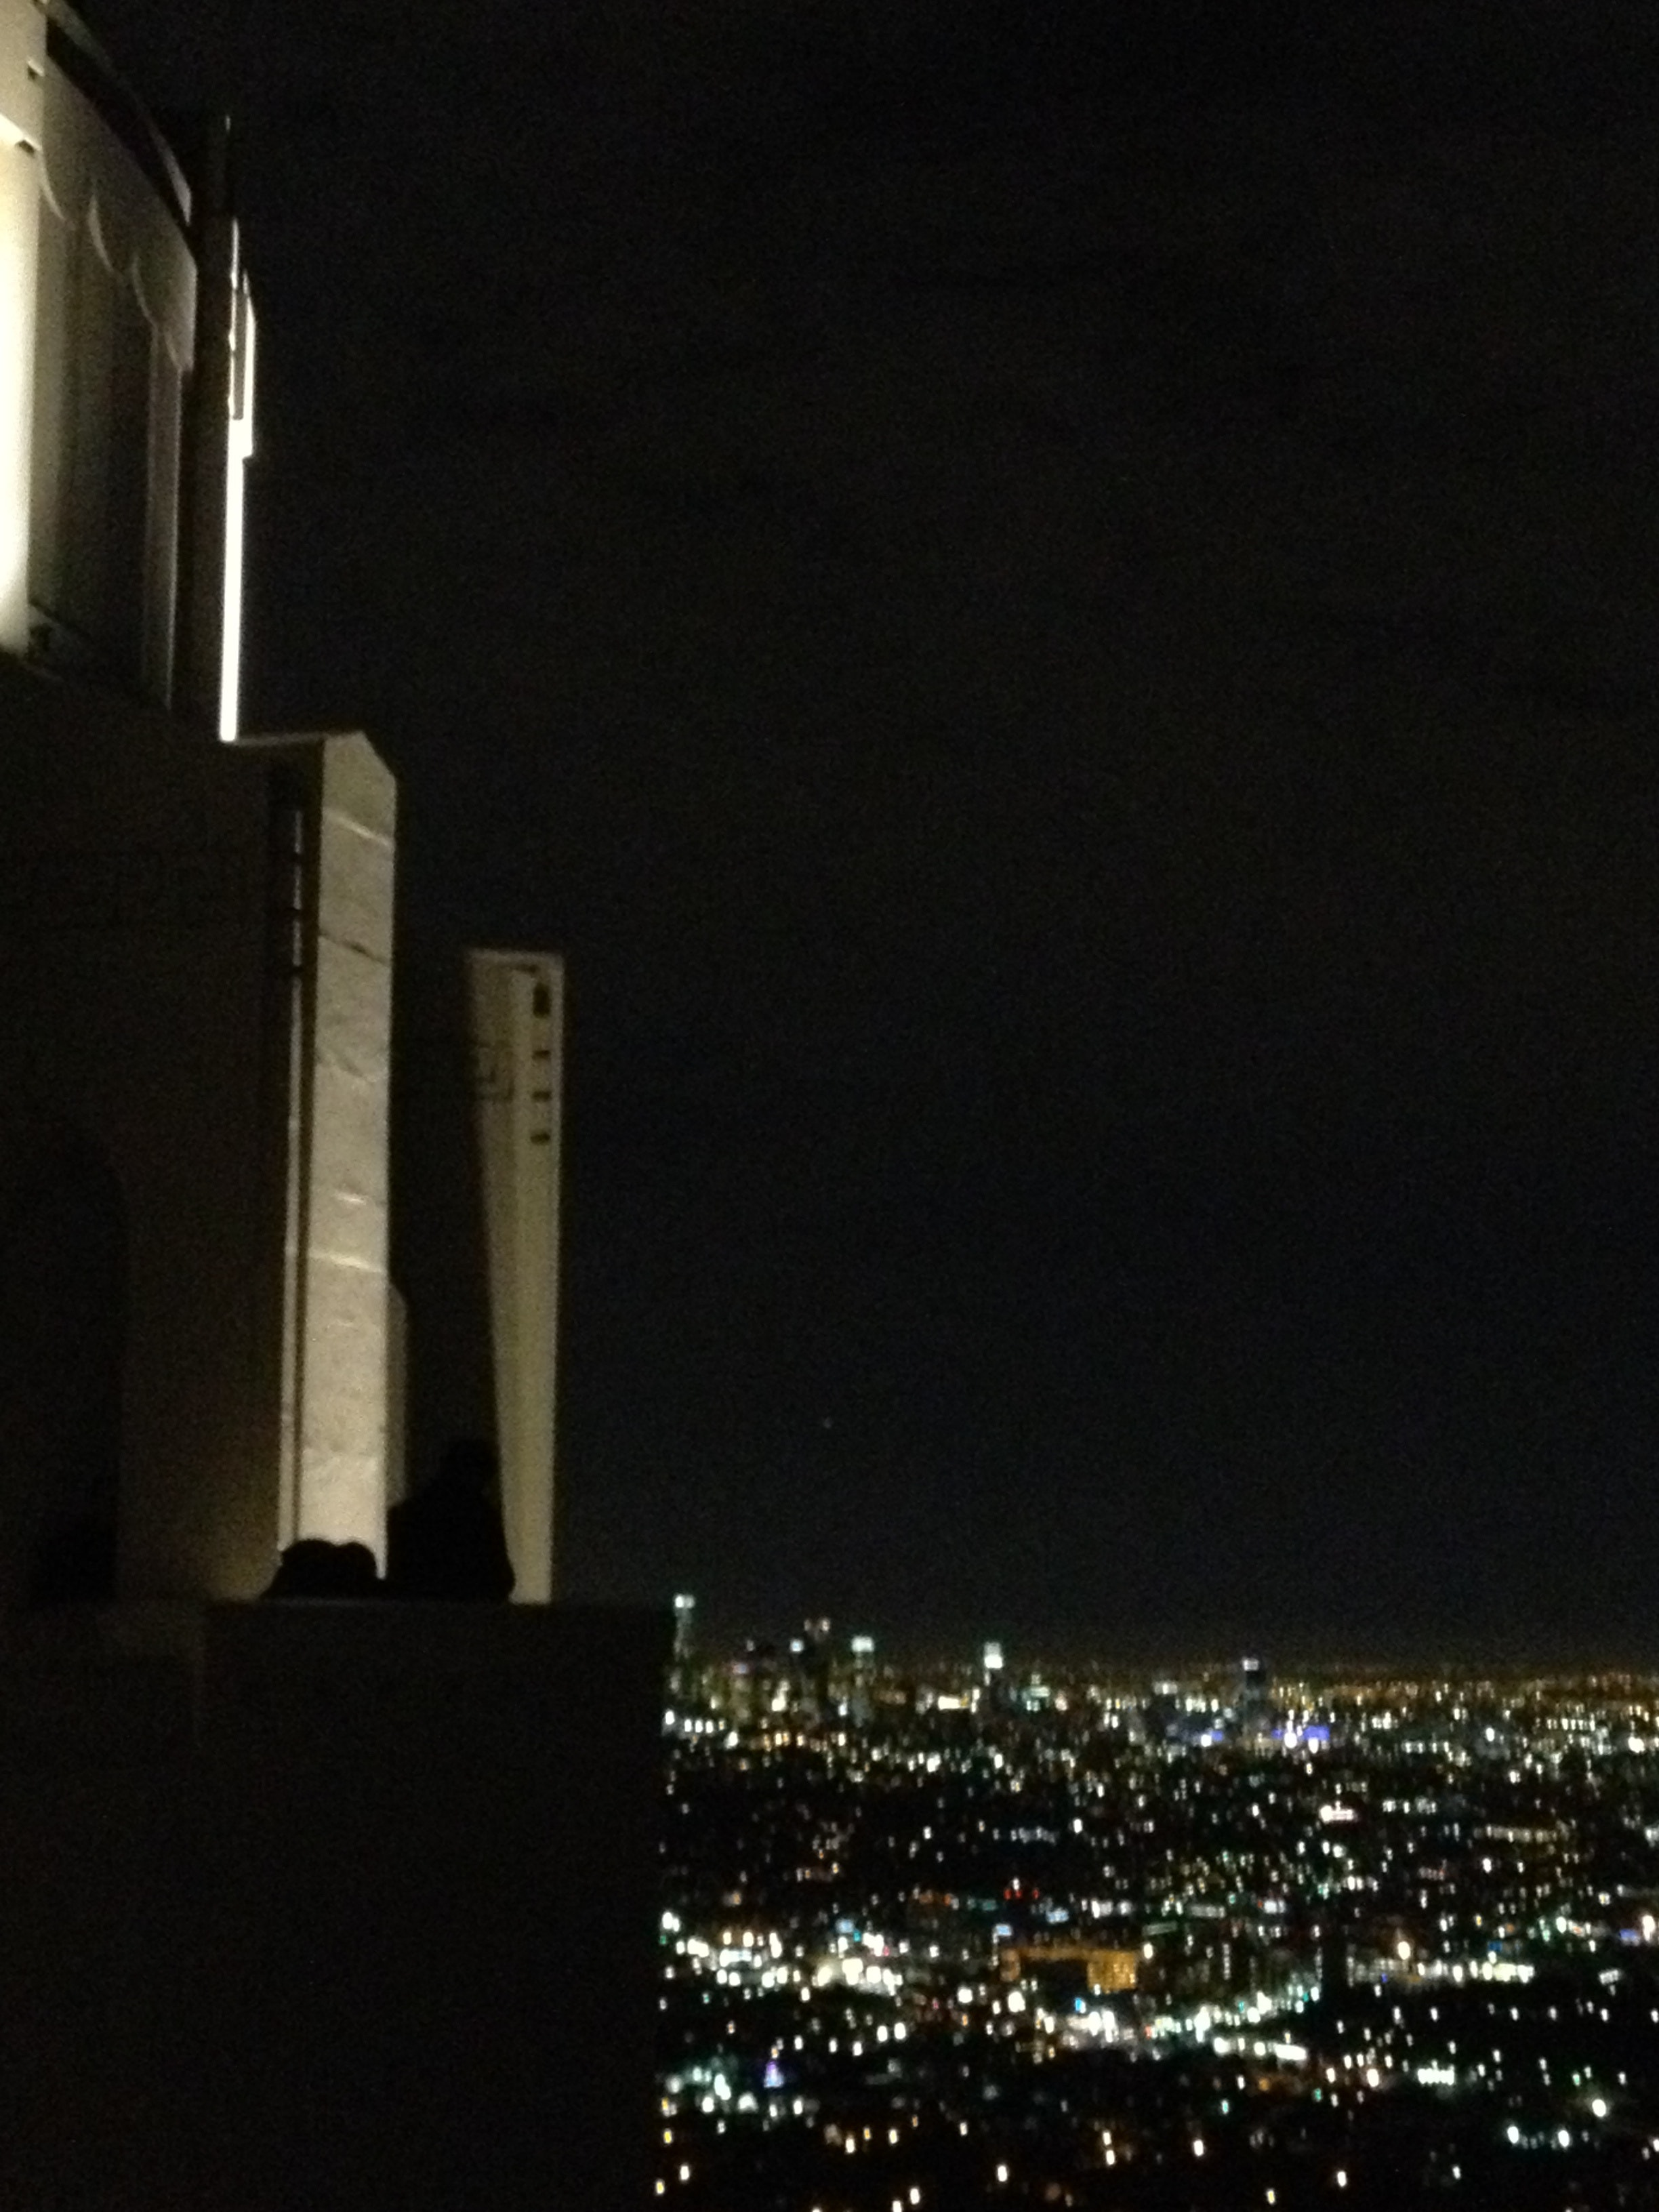 Illuminated Cityscape Against Sky at Night · Free Stock Photo